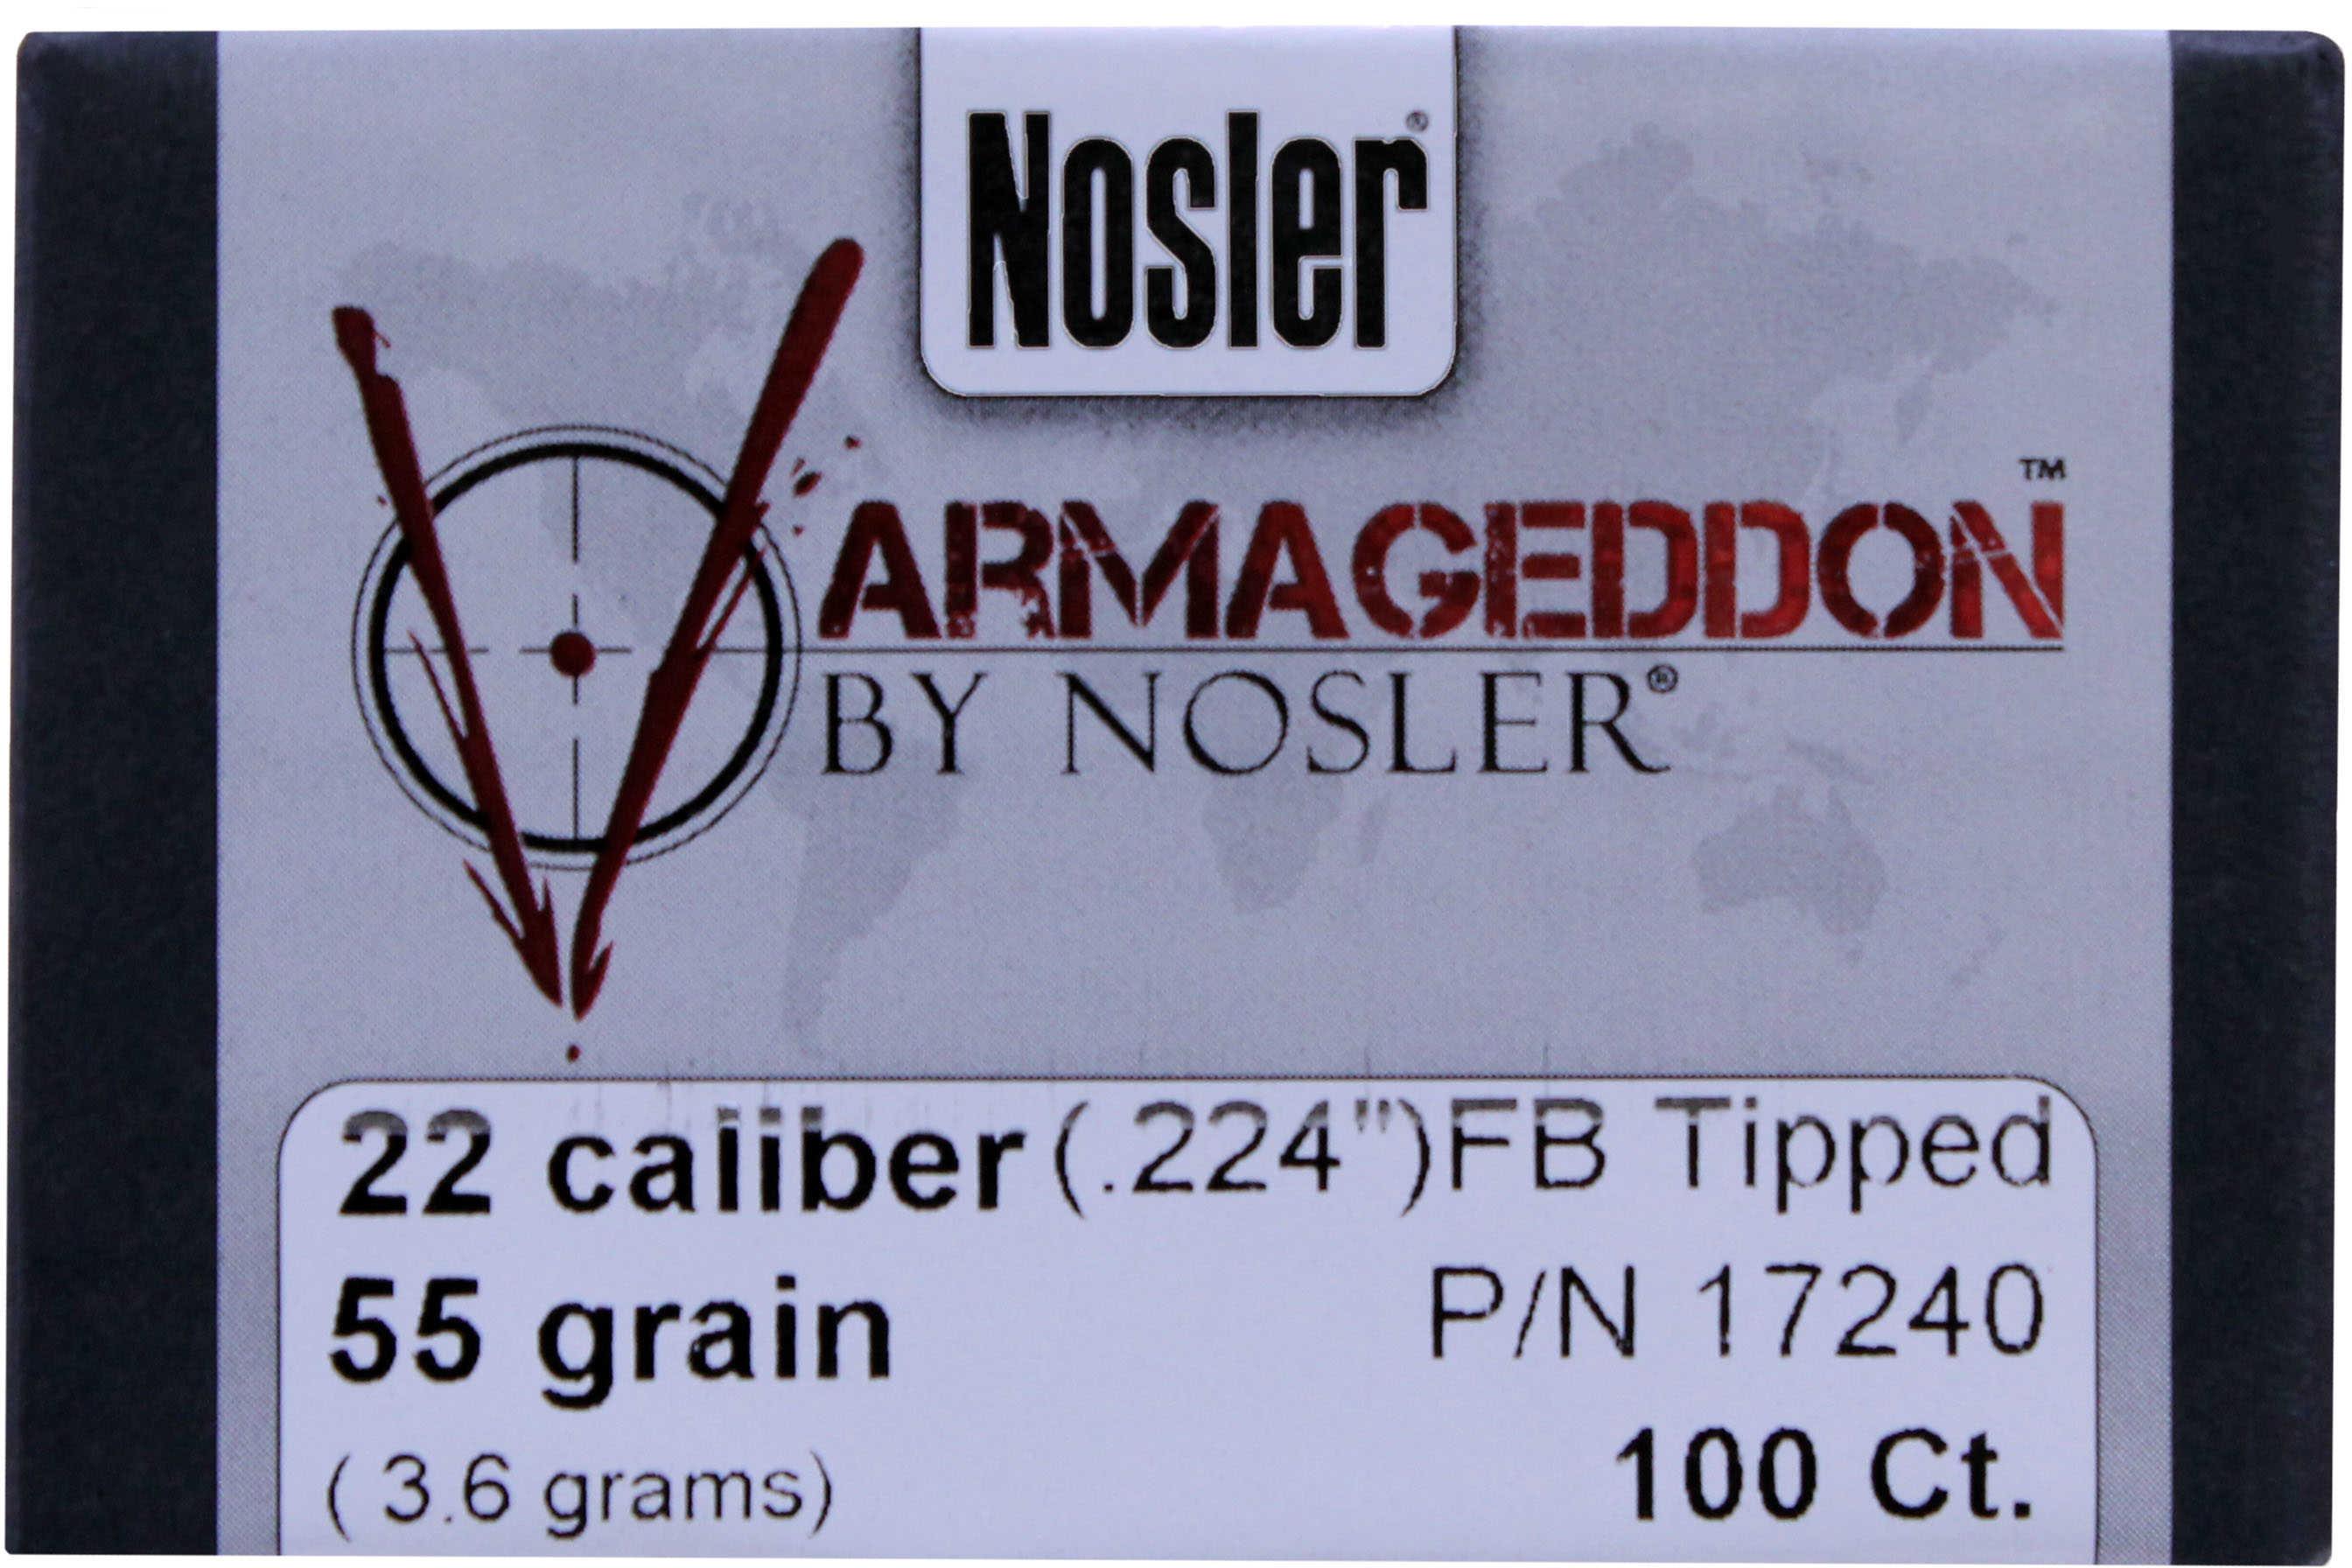 Nosler Varmageddon Bullets 22 Caliber 55 Grains FB Tipped/100 17240